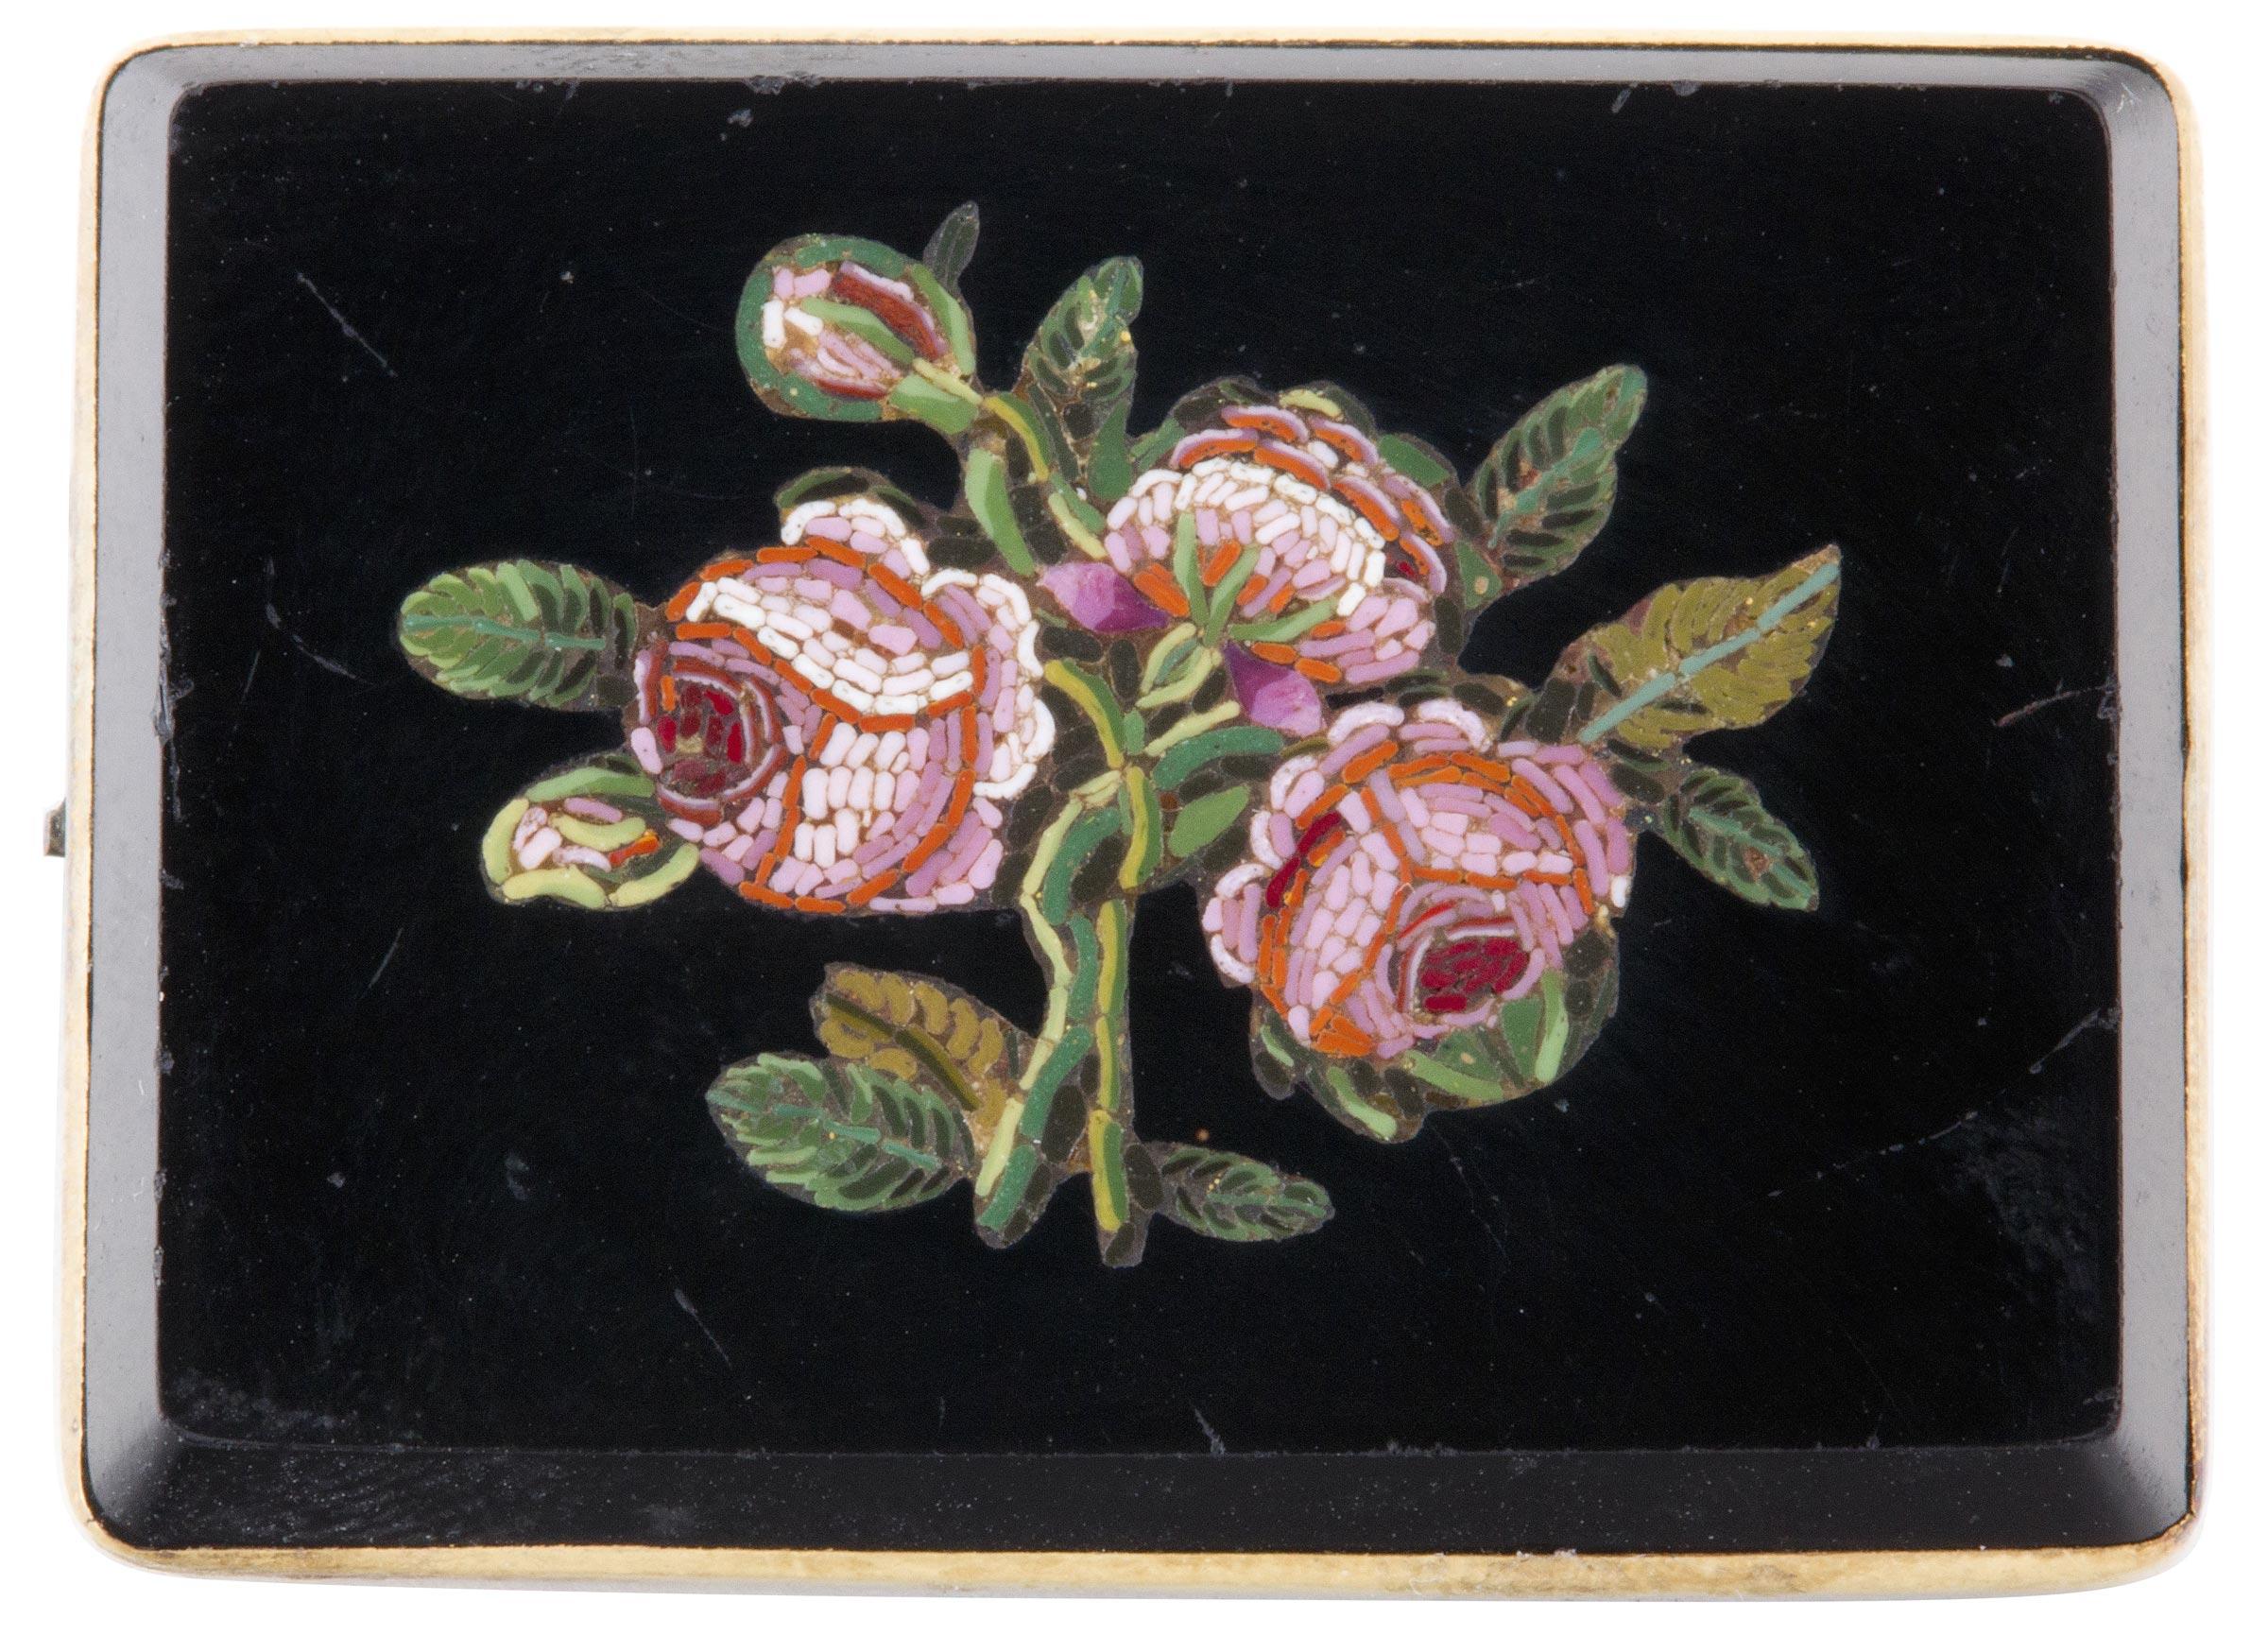 Mosaic tesserae brooch, Italy, ca. 1840–1850. Mosaic tesserae set in black stone on gold mount, 1 ⅝ x 1 3⁄16 in. (4.1 x 3 cm). Worcester Art Museum, Bequest of Stephen Salisbury III, 1907.437.1.